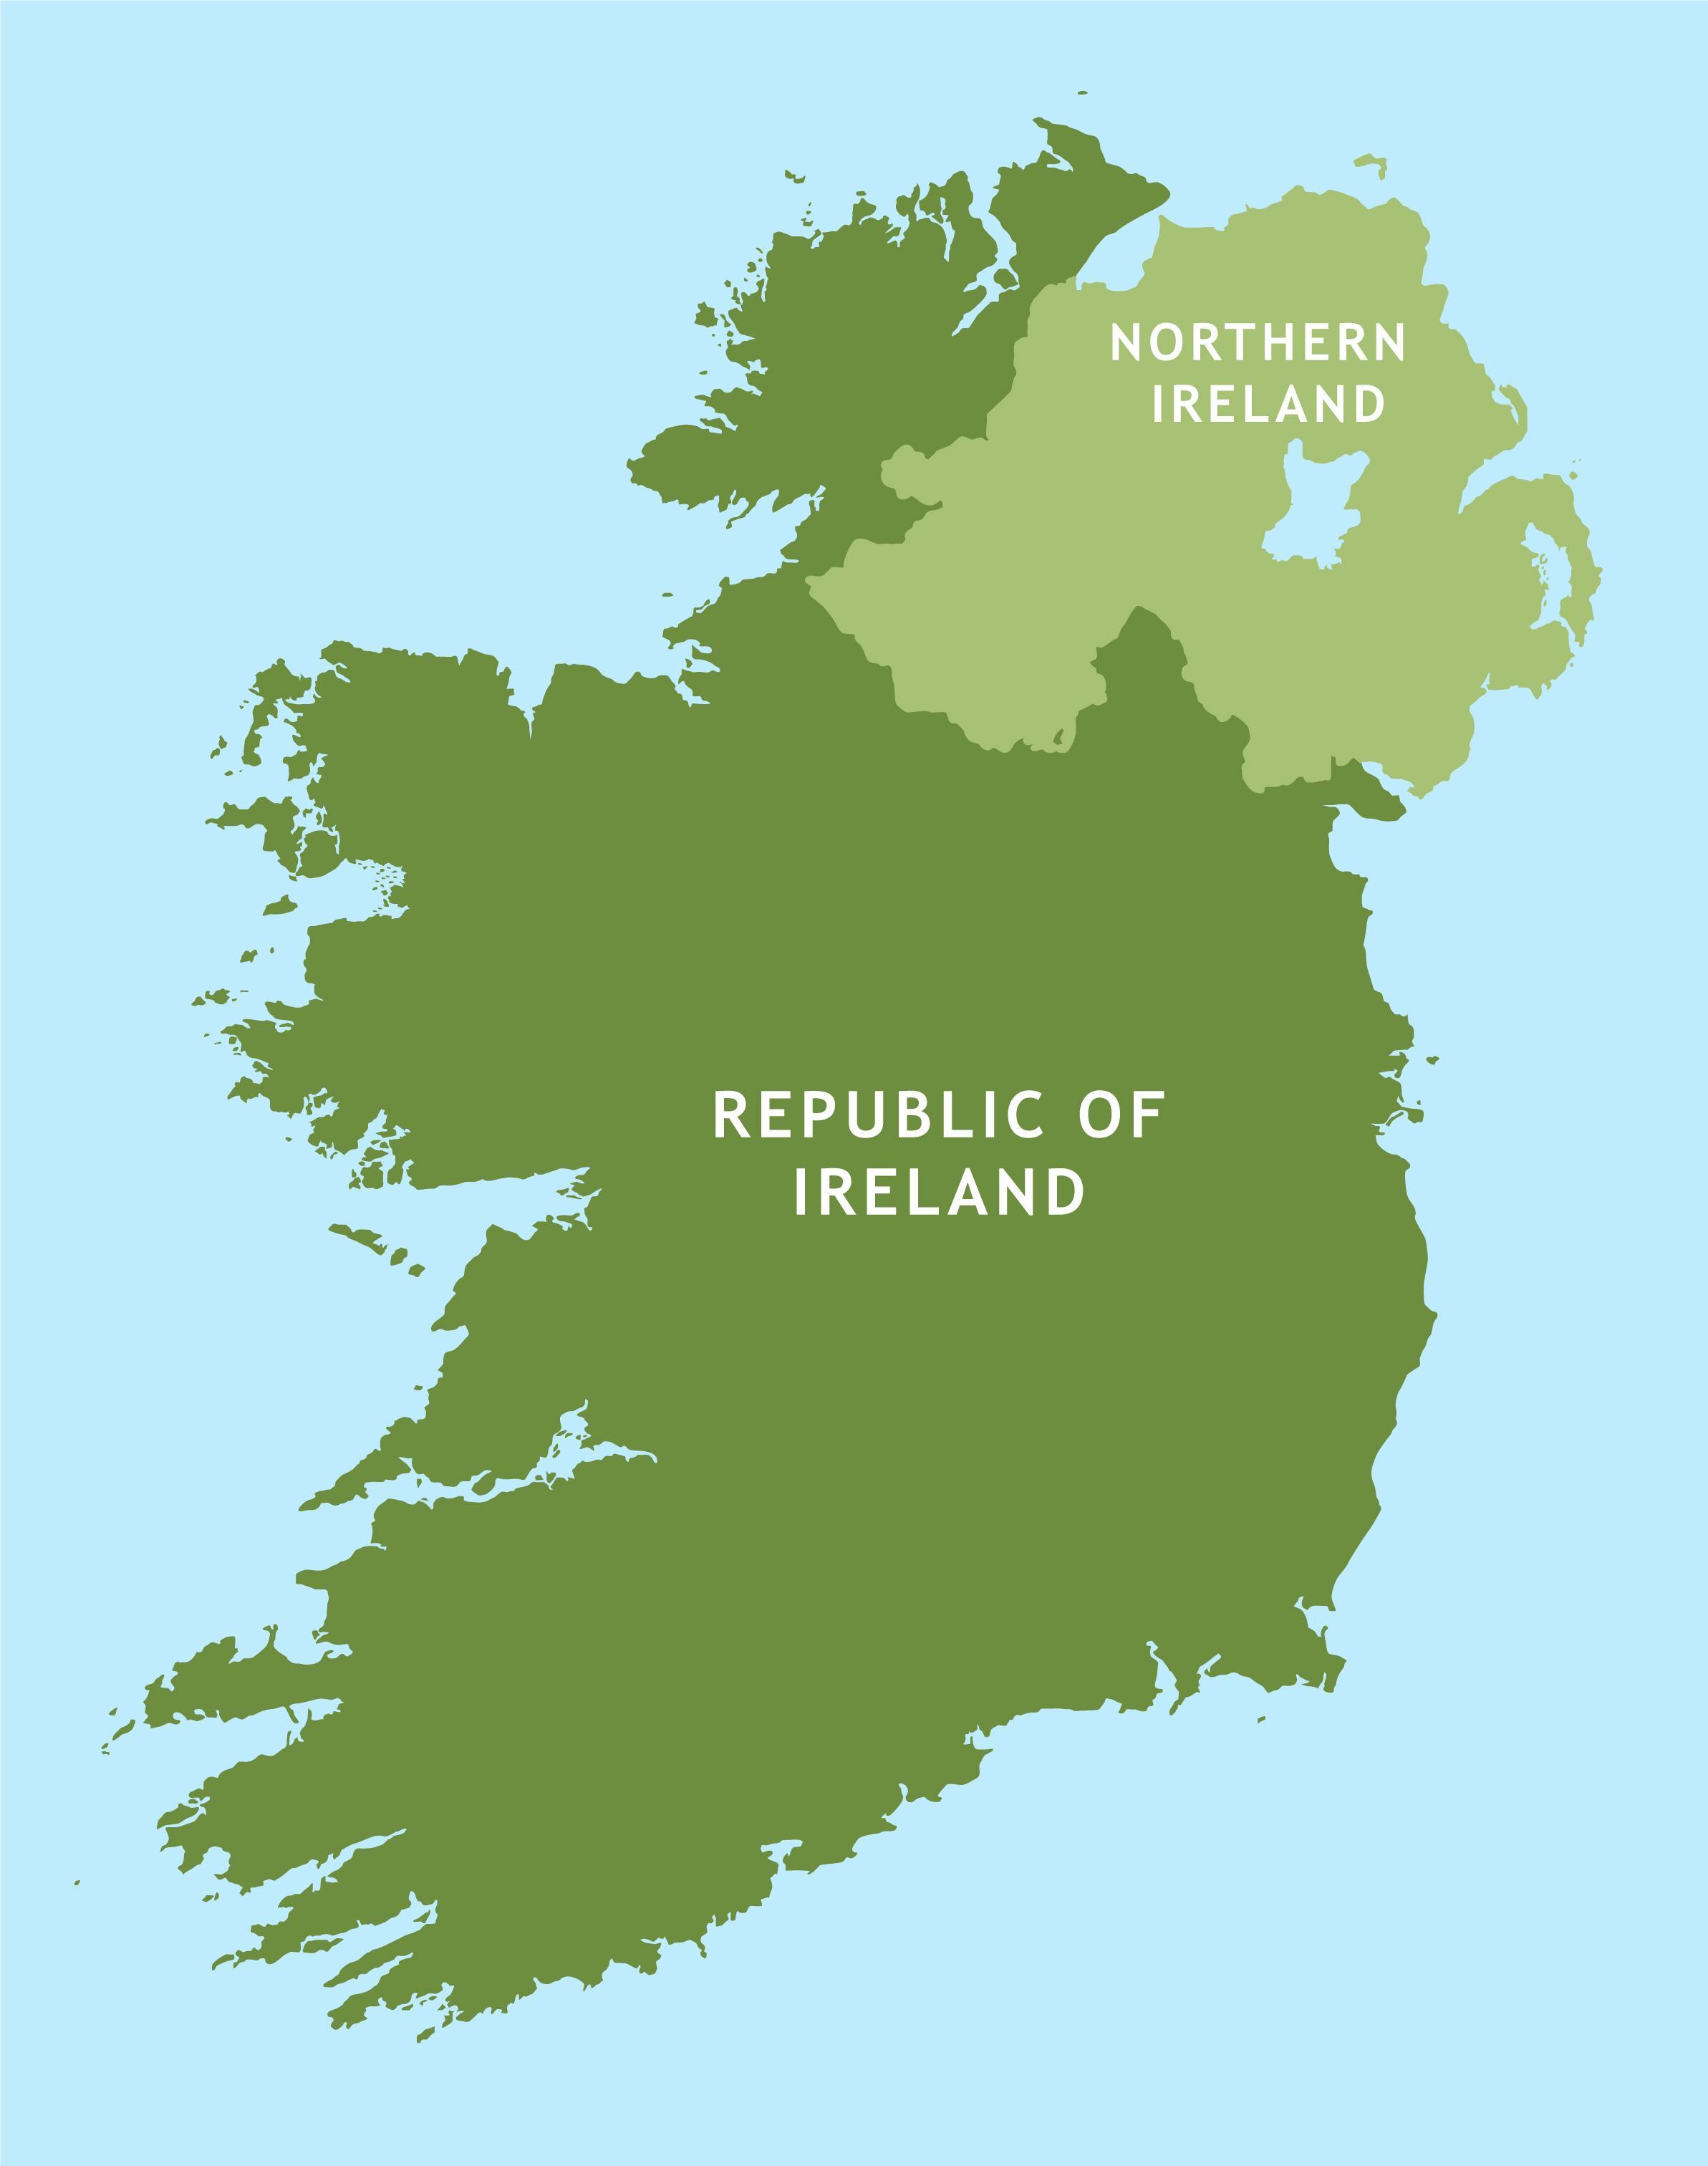 Irsko Mapa Silnicni Mapa Irska Severni Evropa Evropa